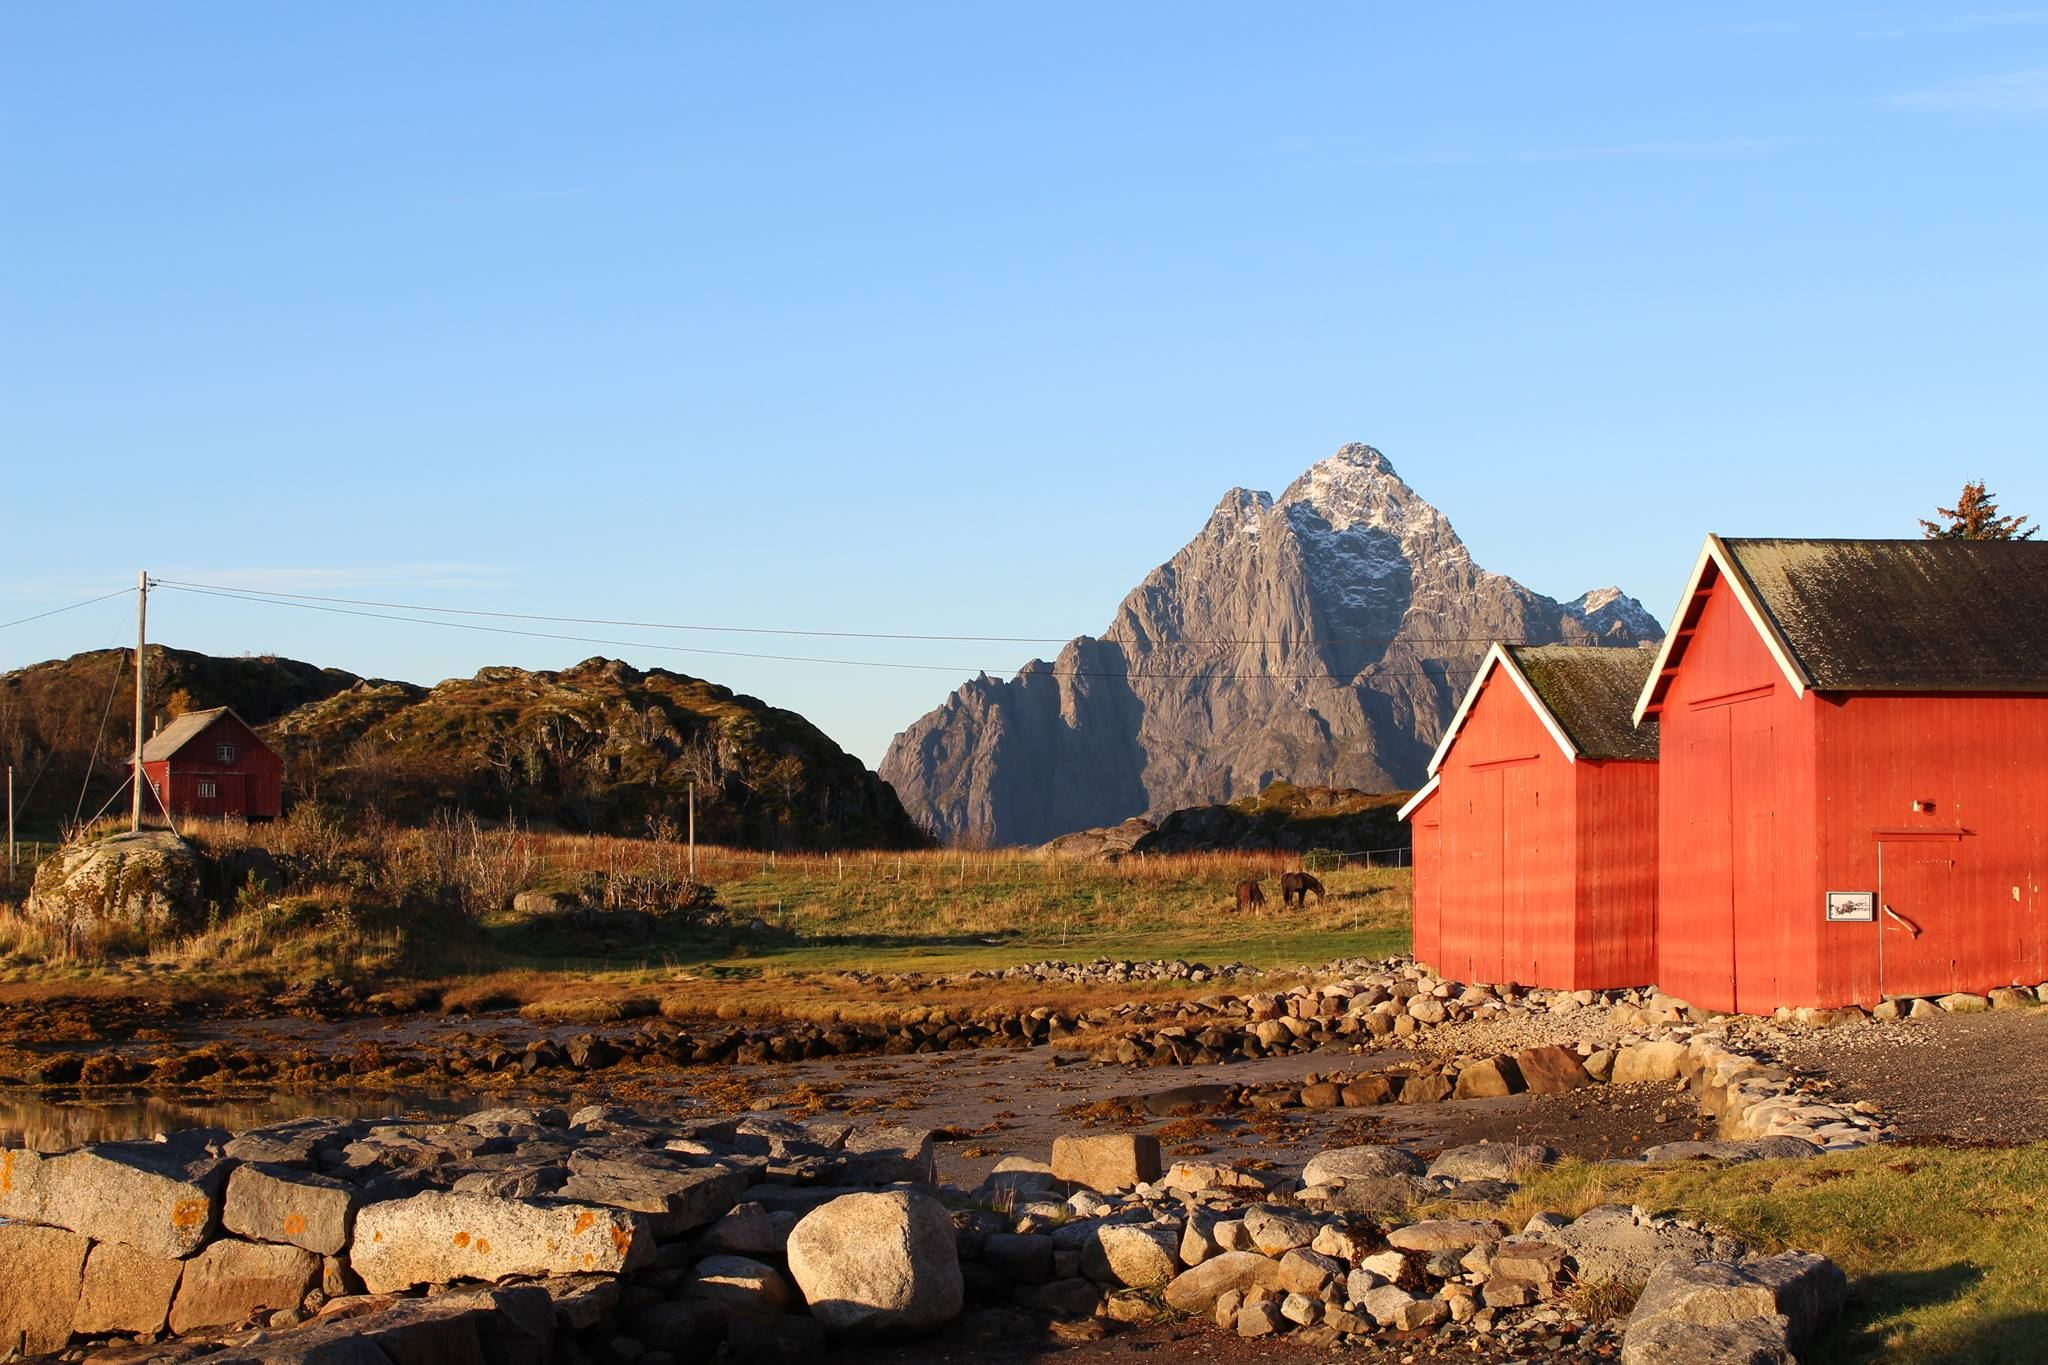 © Lena Karlstrøm / Museum Nord, The Lofoten Museum